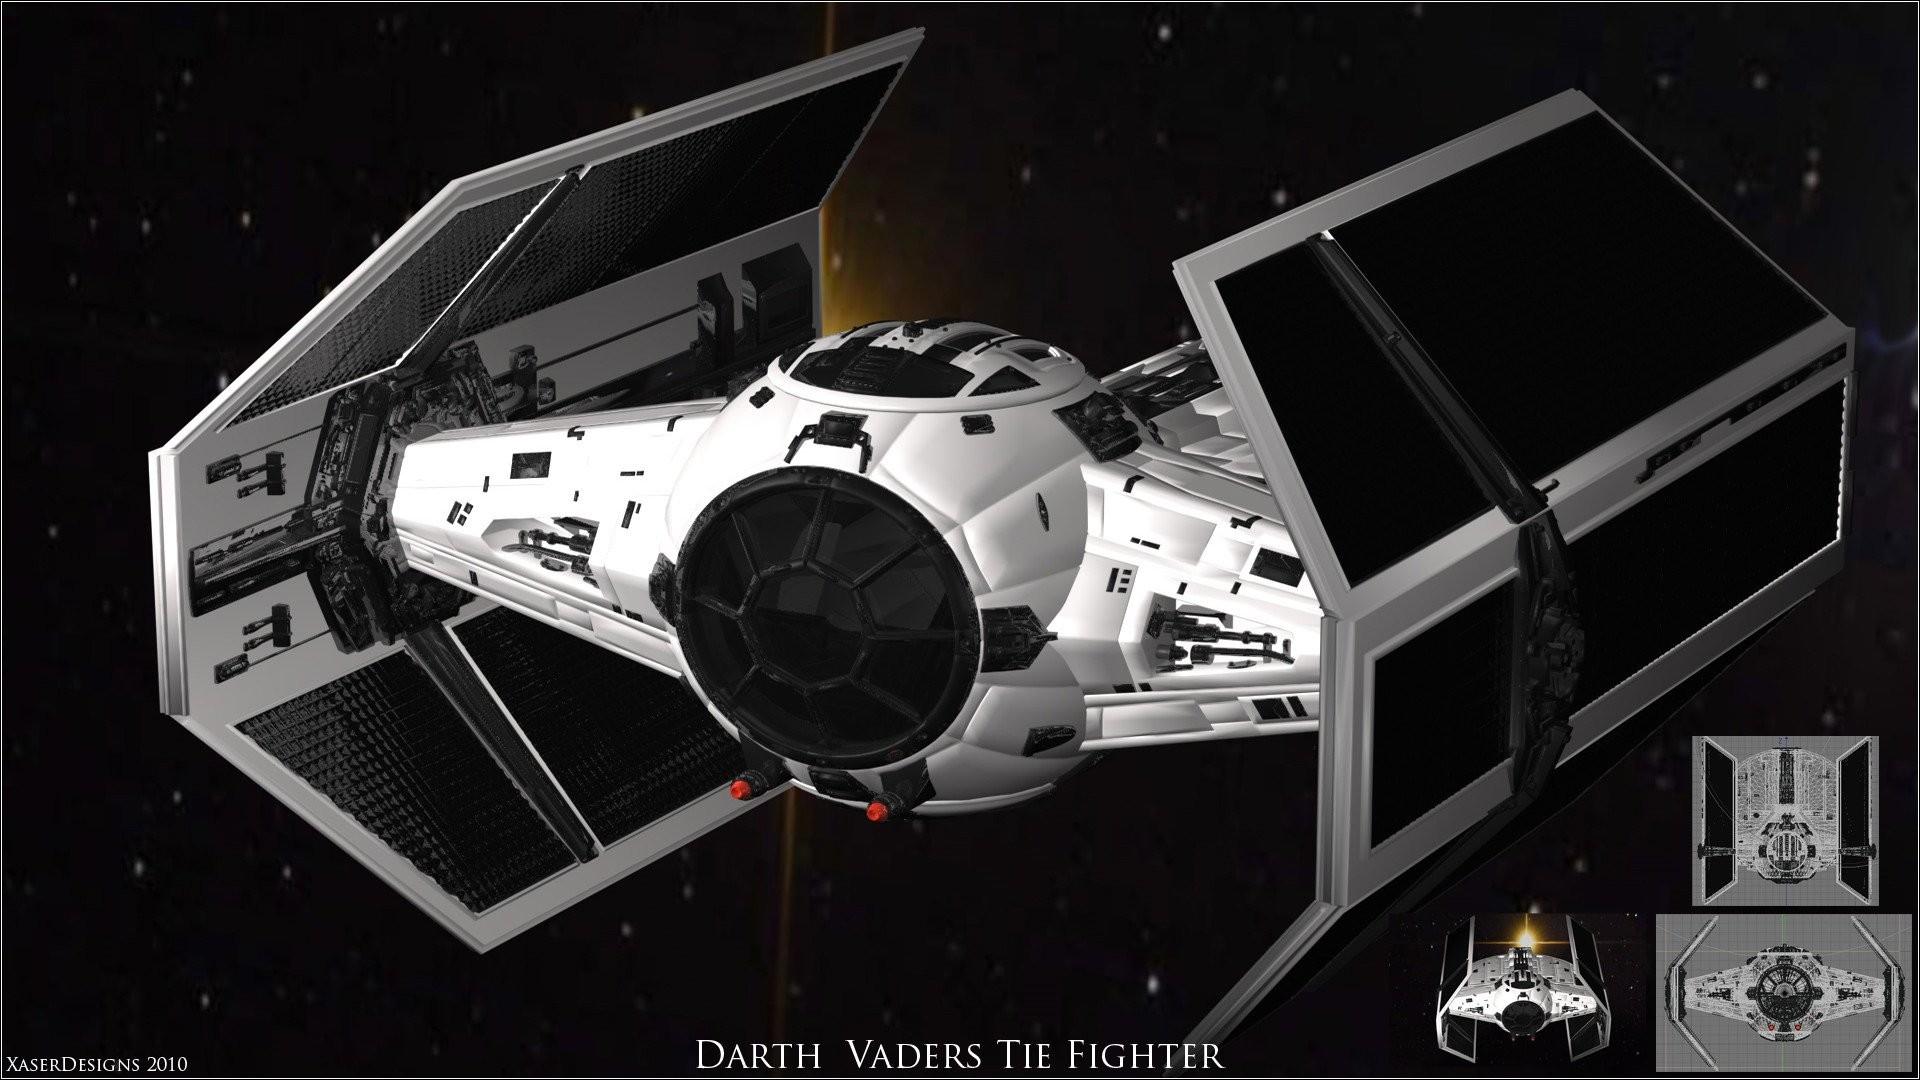 TIE FIGHTER star wars futuristic spaceship space sci-fi wallpaper      811257   WallpaperUP